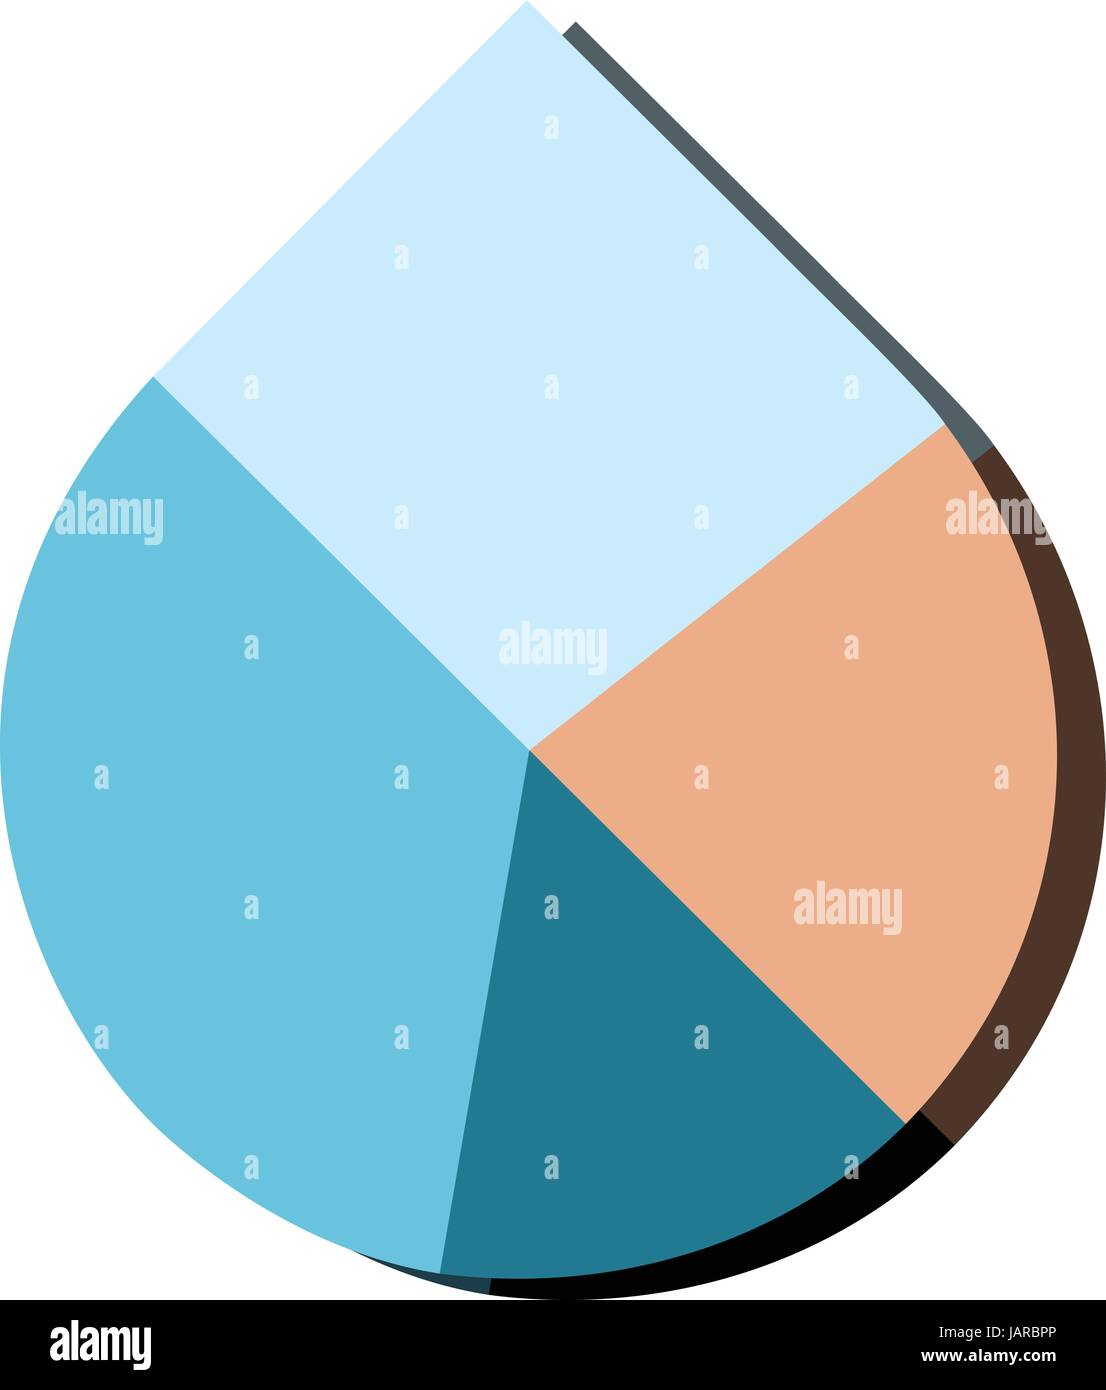 Modern flat design vector water drop pie chart in various colors modern flat design vector water drop pie chart in various colors ccuart Choice Image